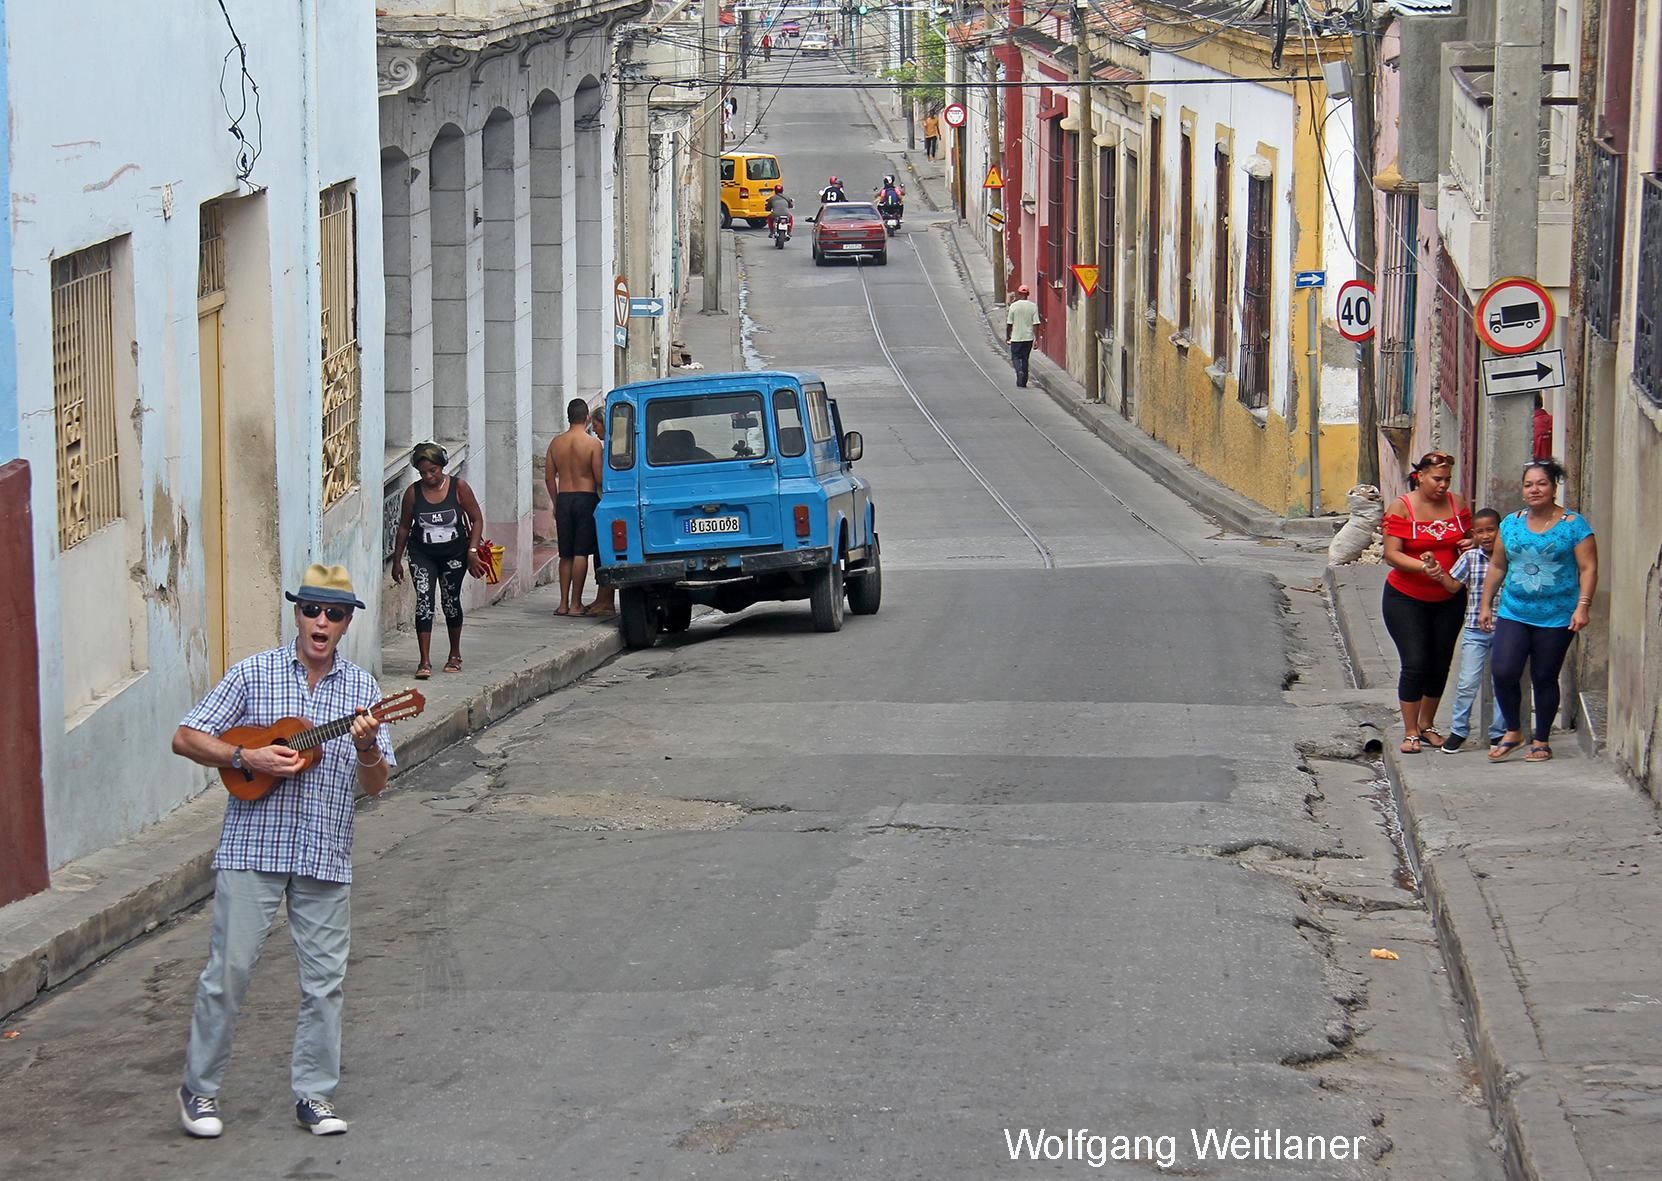 Spontan-Ständchen in Santiago de Cuba, Kuba